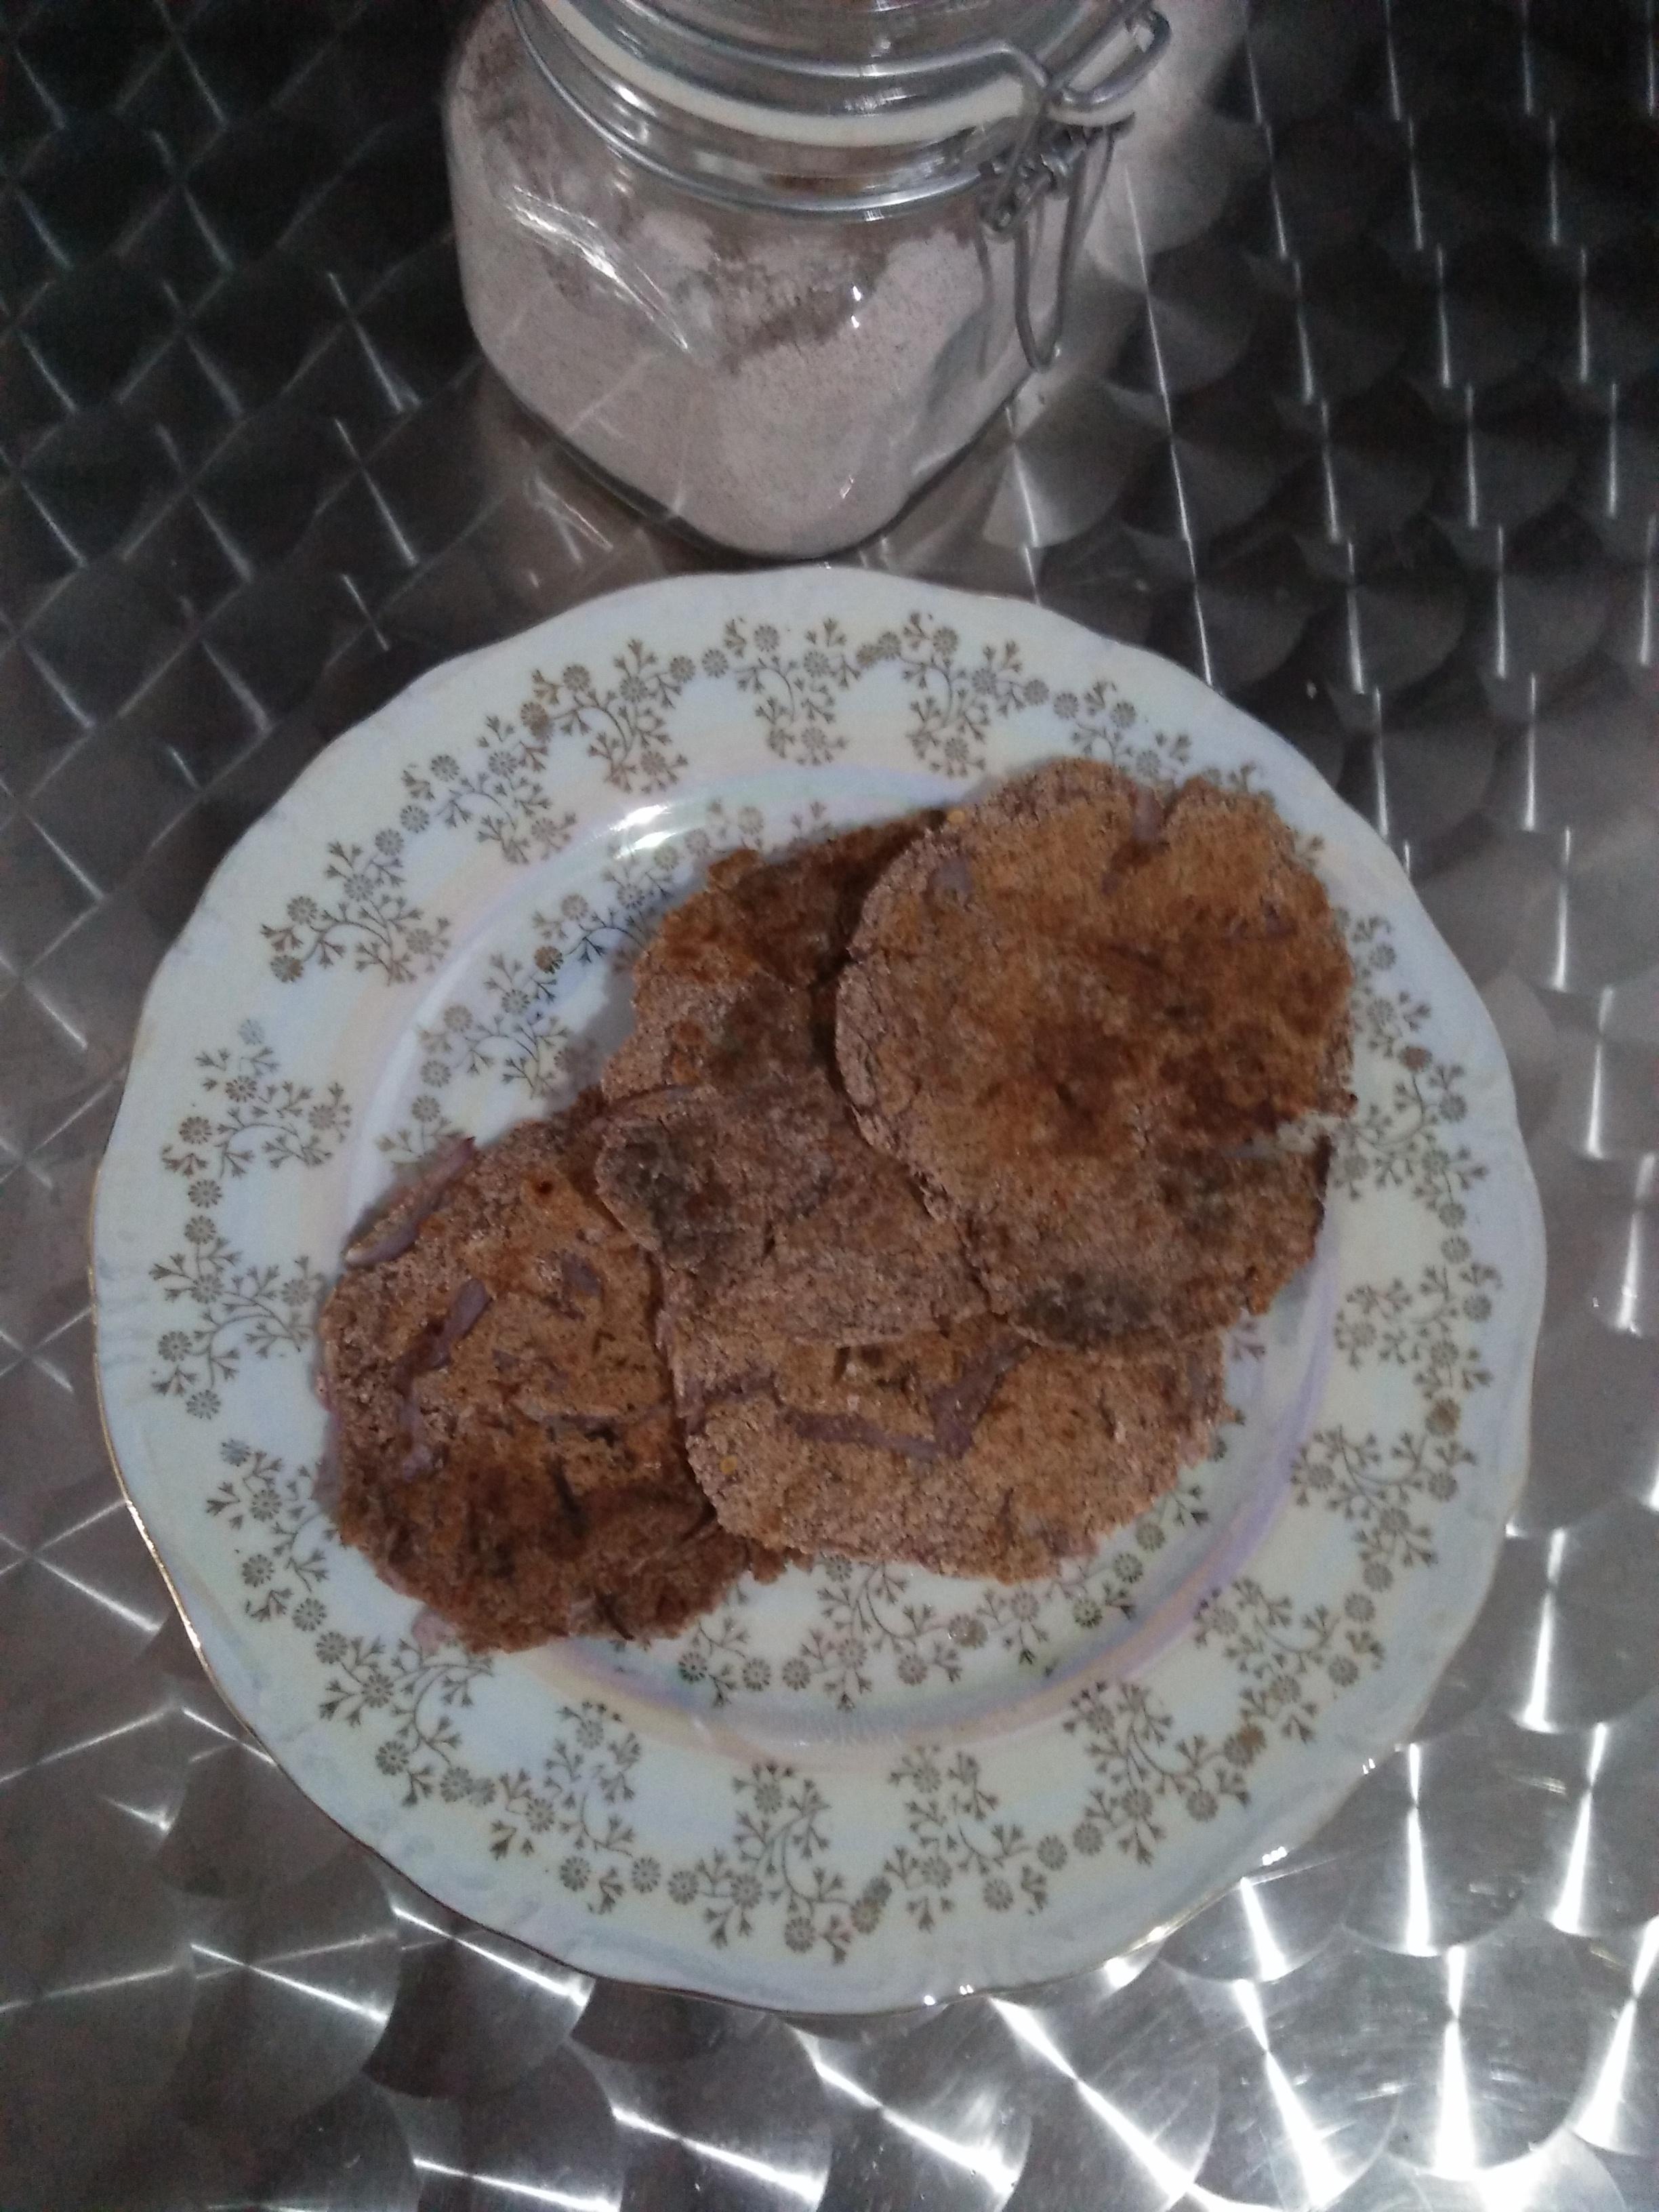 Pol Roti (Coconut Roti)